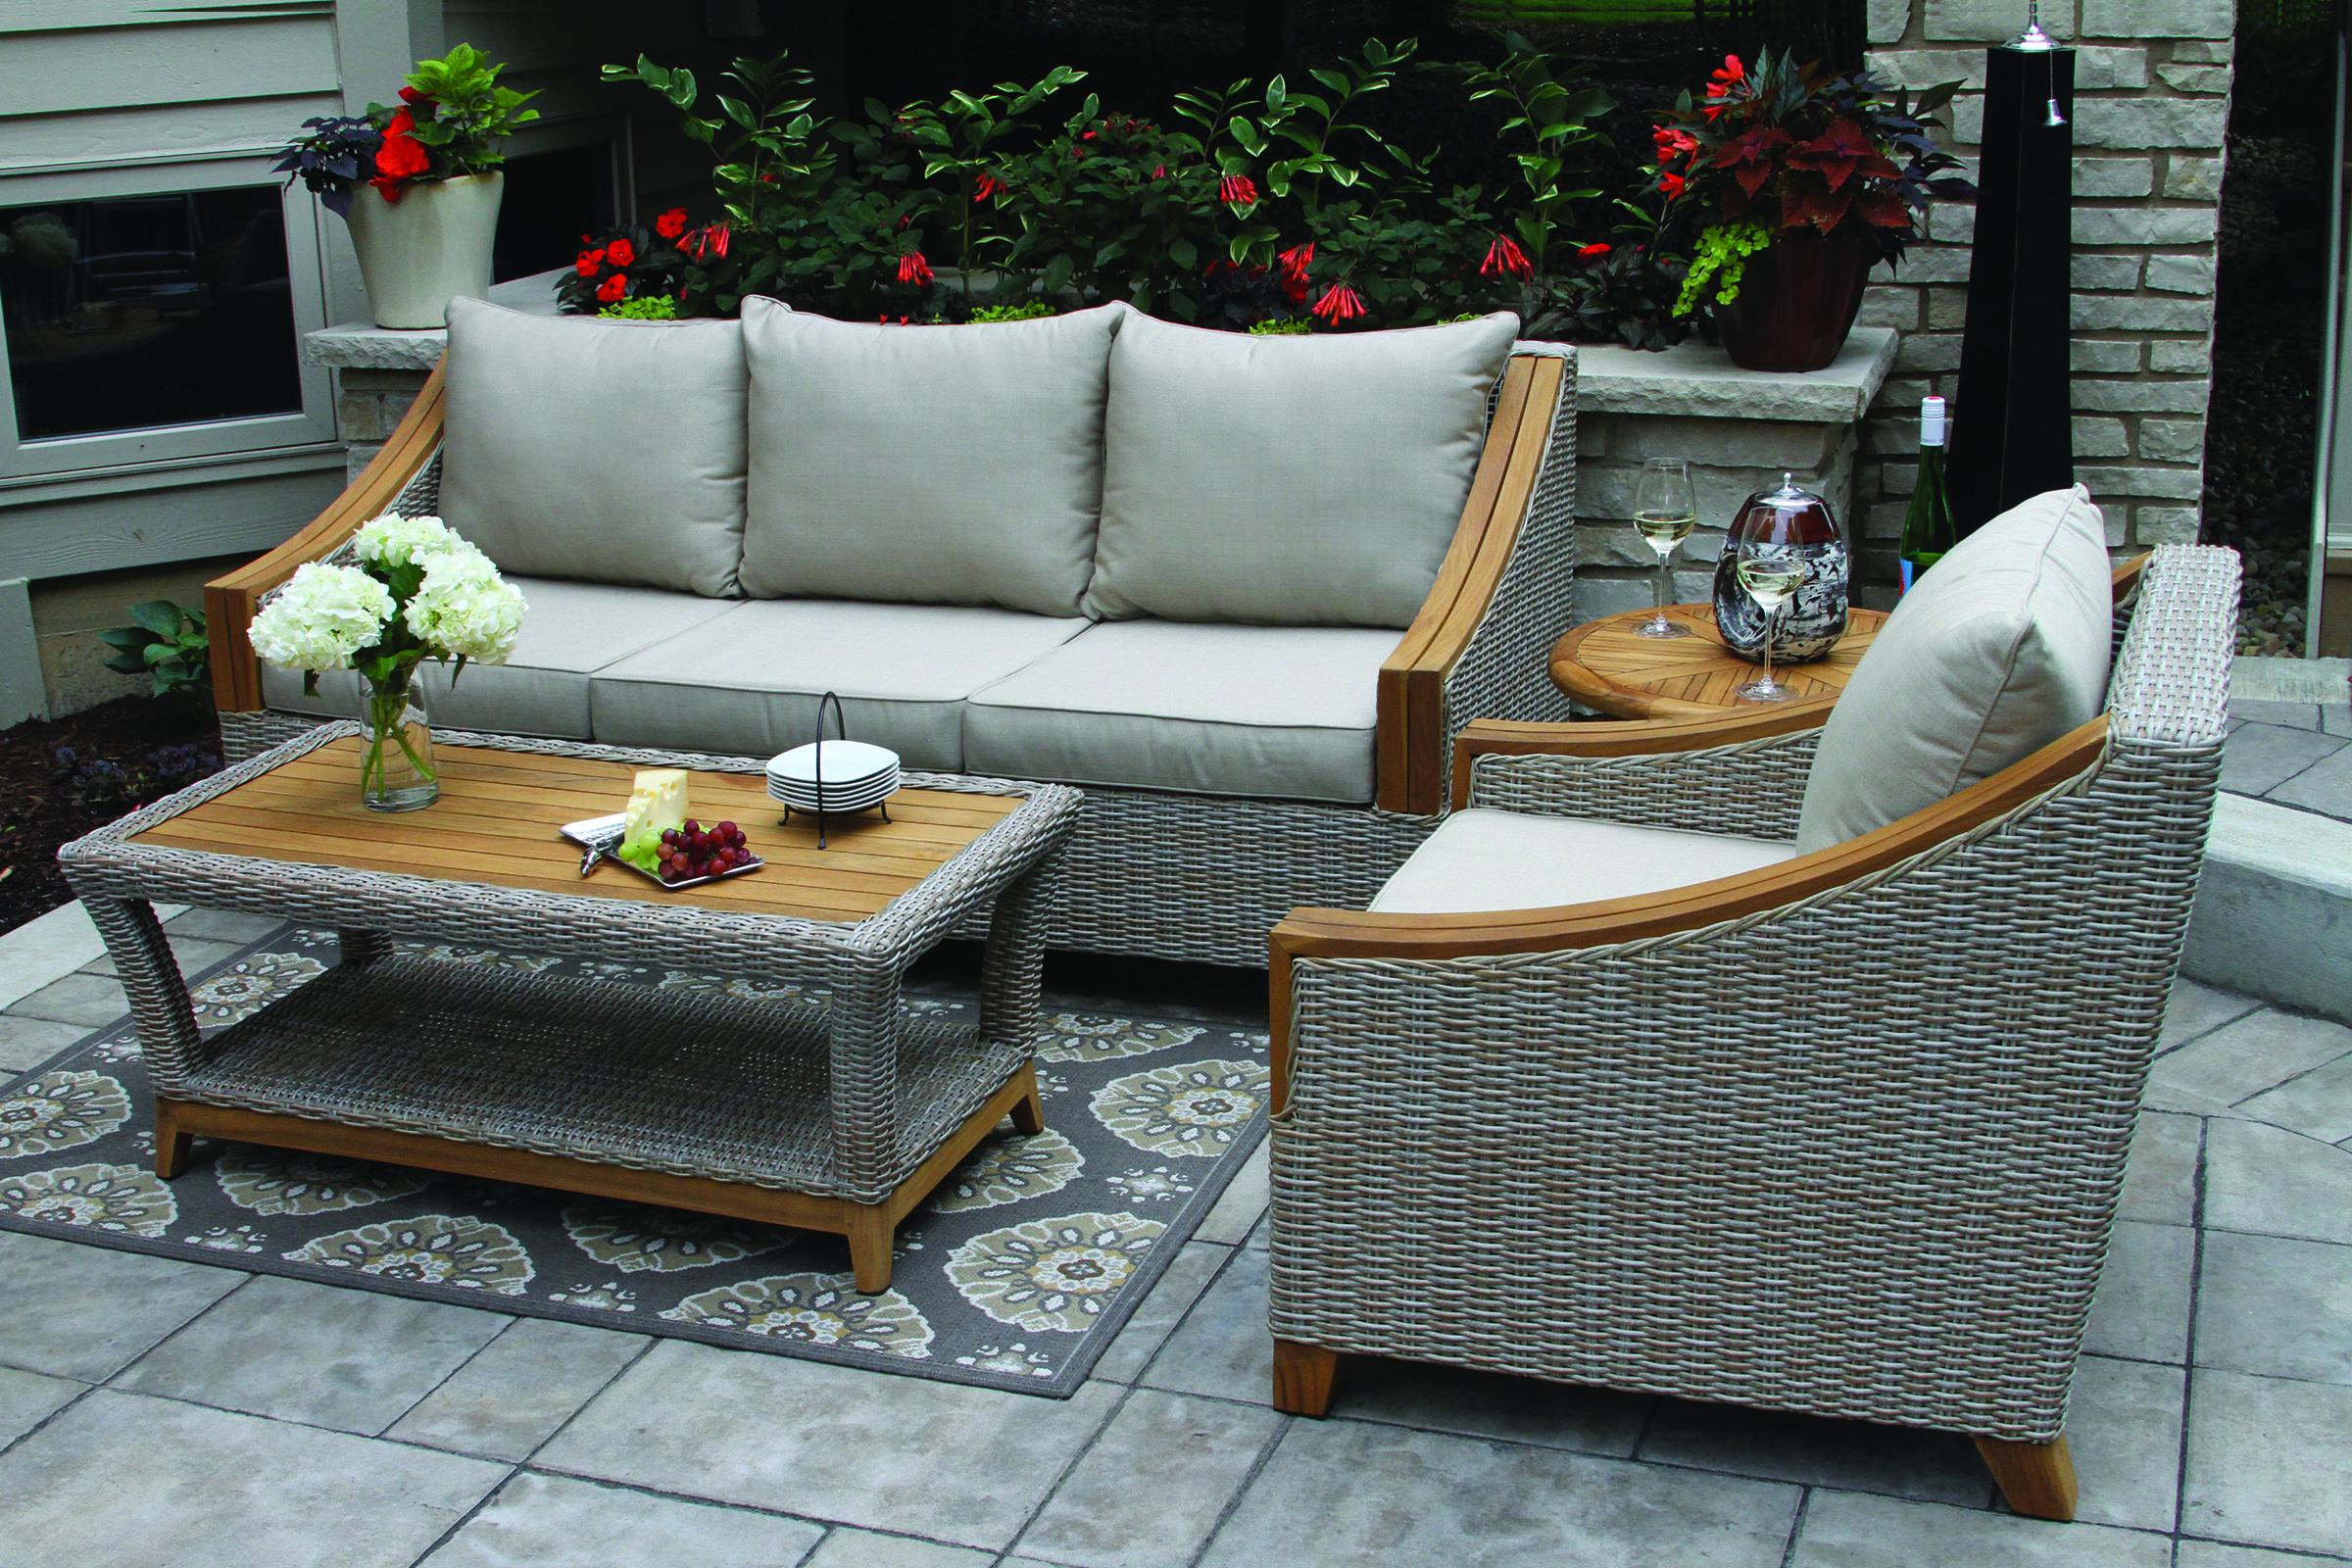 Vineyard Teak Wicker Sofa Set With Sunbrella Cushions Pillows Outdoor Wood Furniture Sunbrella Cushions Outdoor Furniture